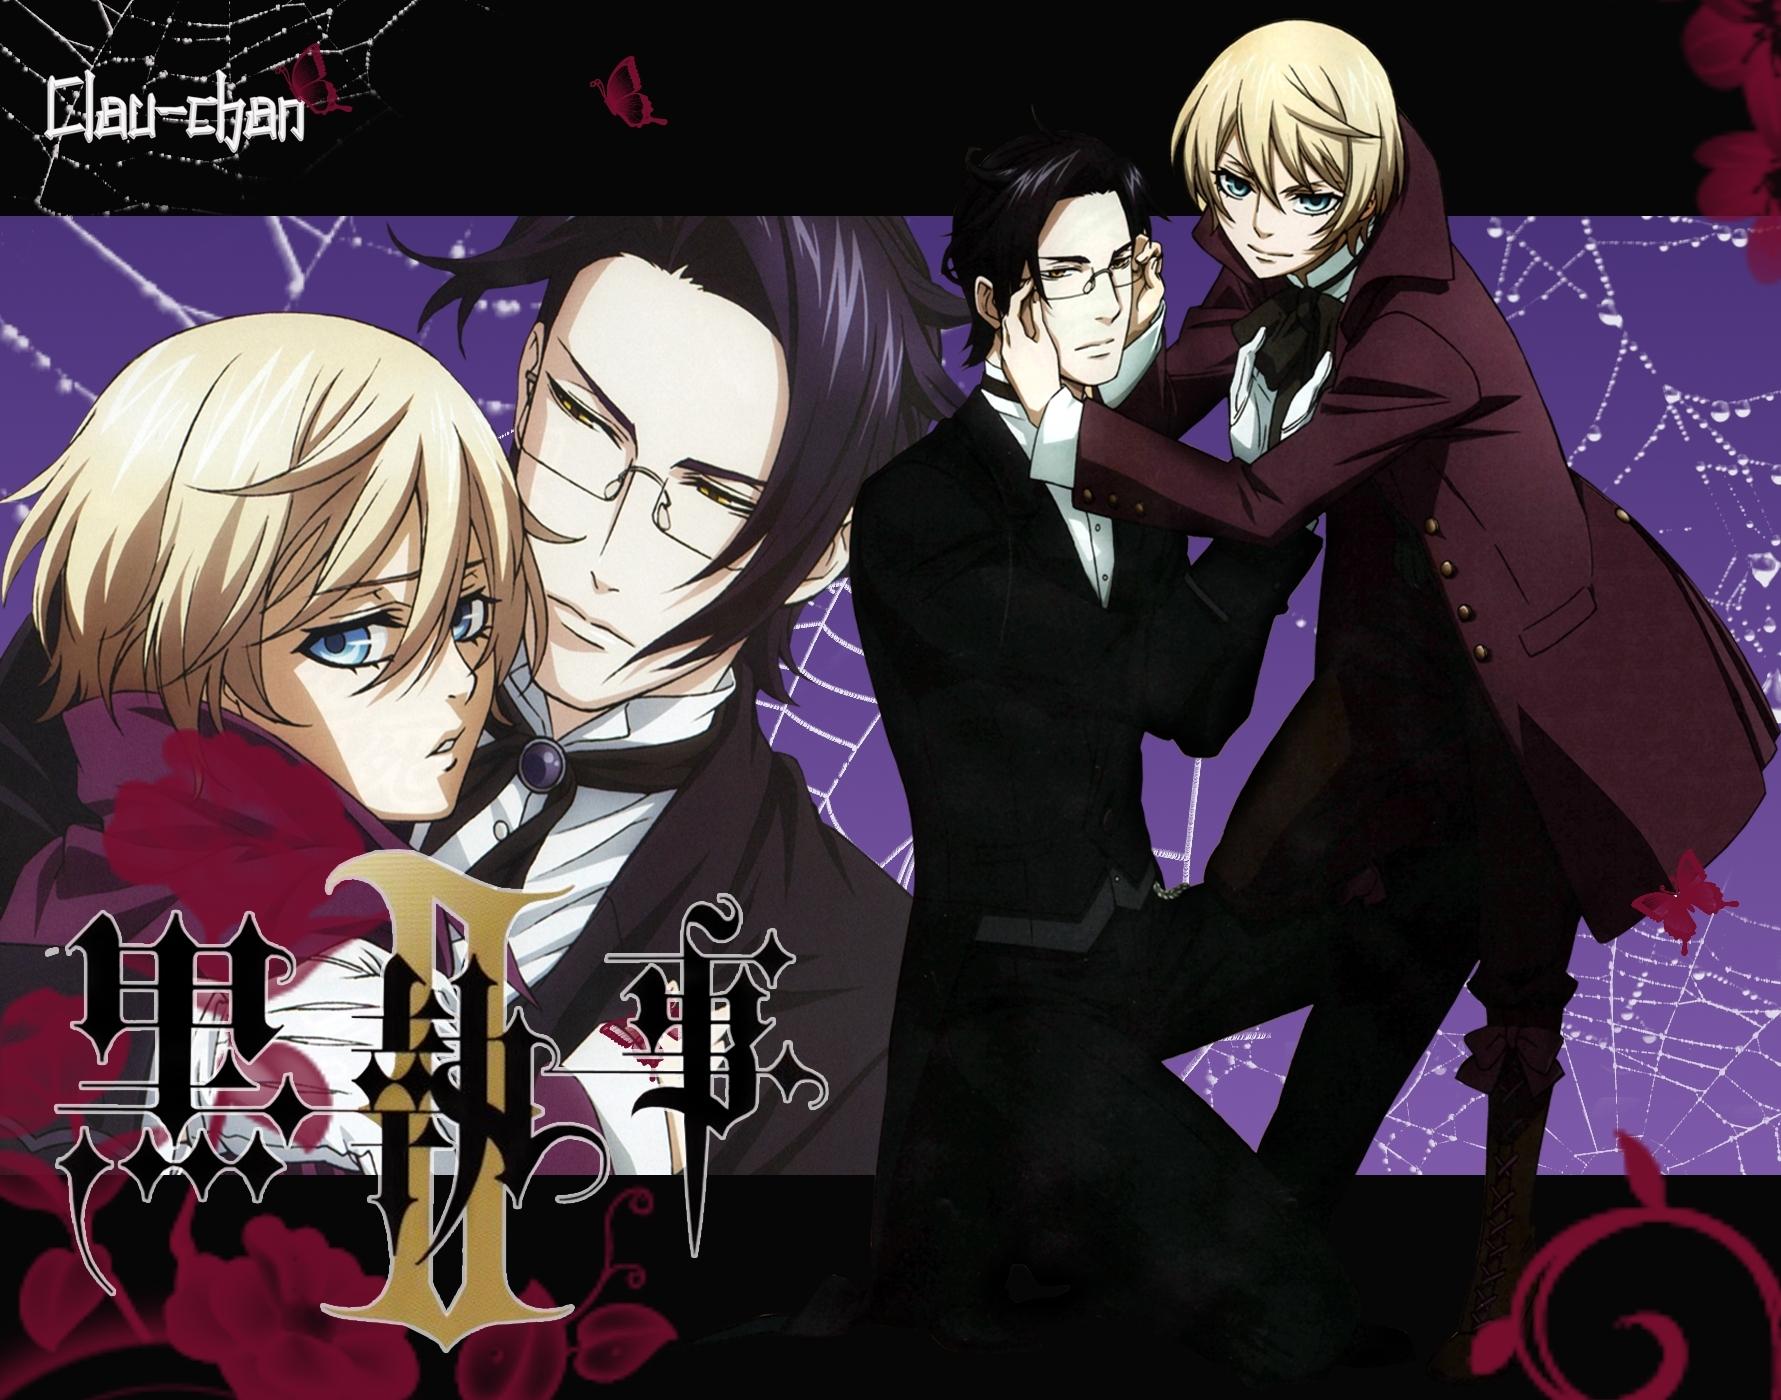 http://images4.fanpop.com/image/photos/15600000/Alois-y-Claude-kuro-2-kuroshitsuji-15609137-1781-1400.jpg